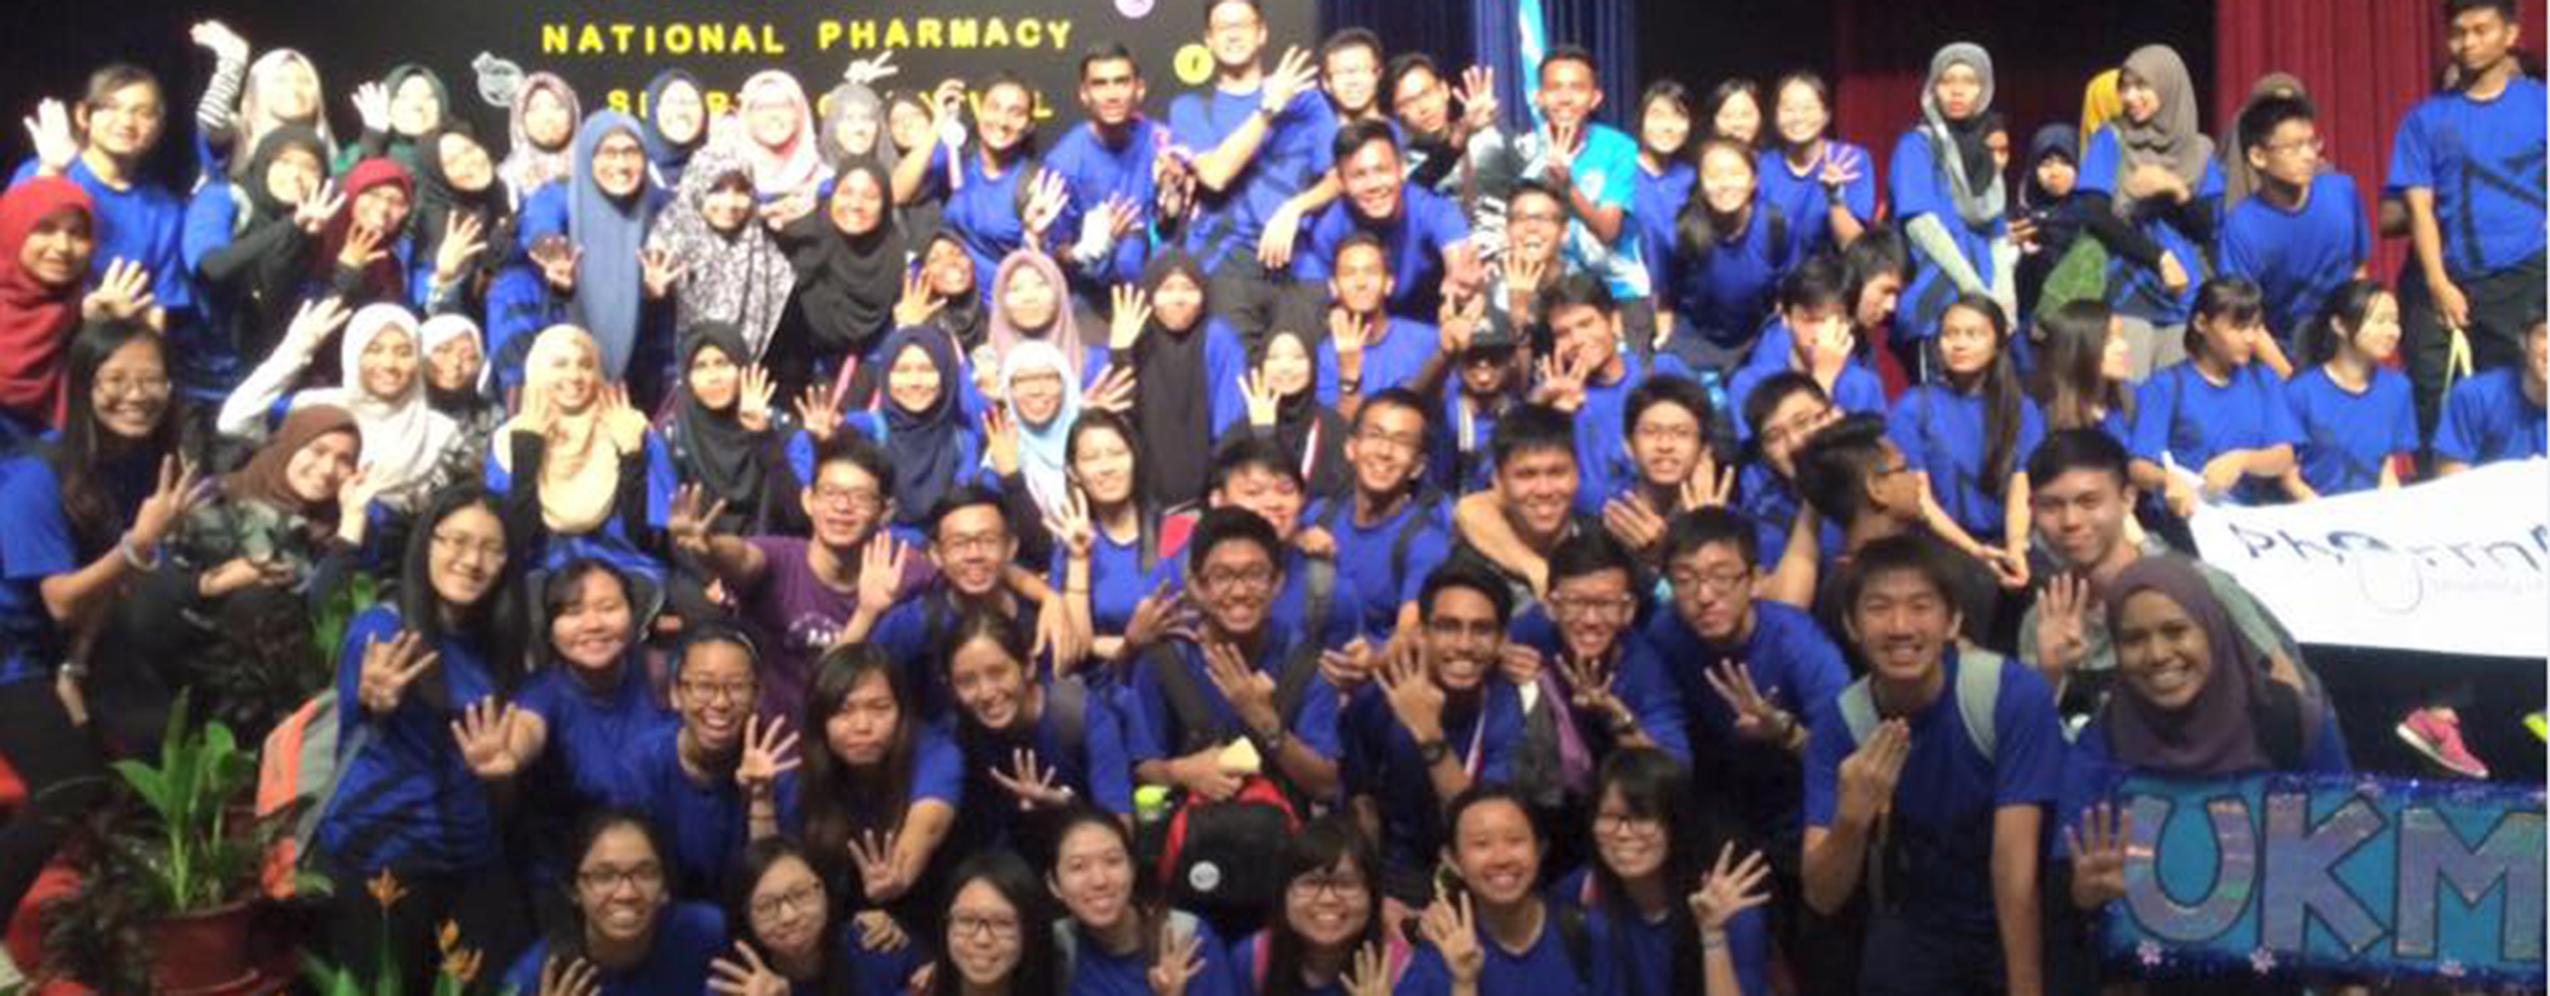 National Pharmacy Sports Carnival (NPSC)